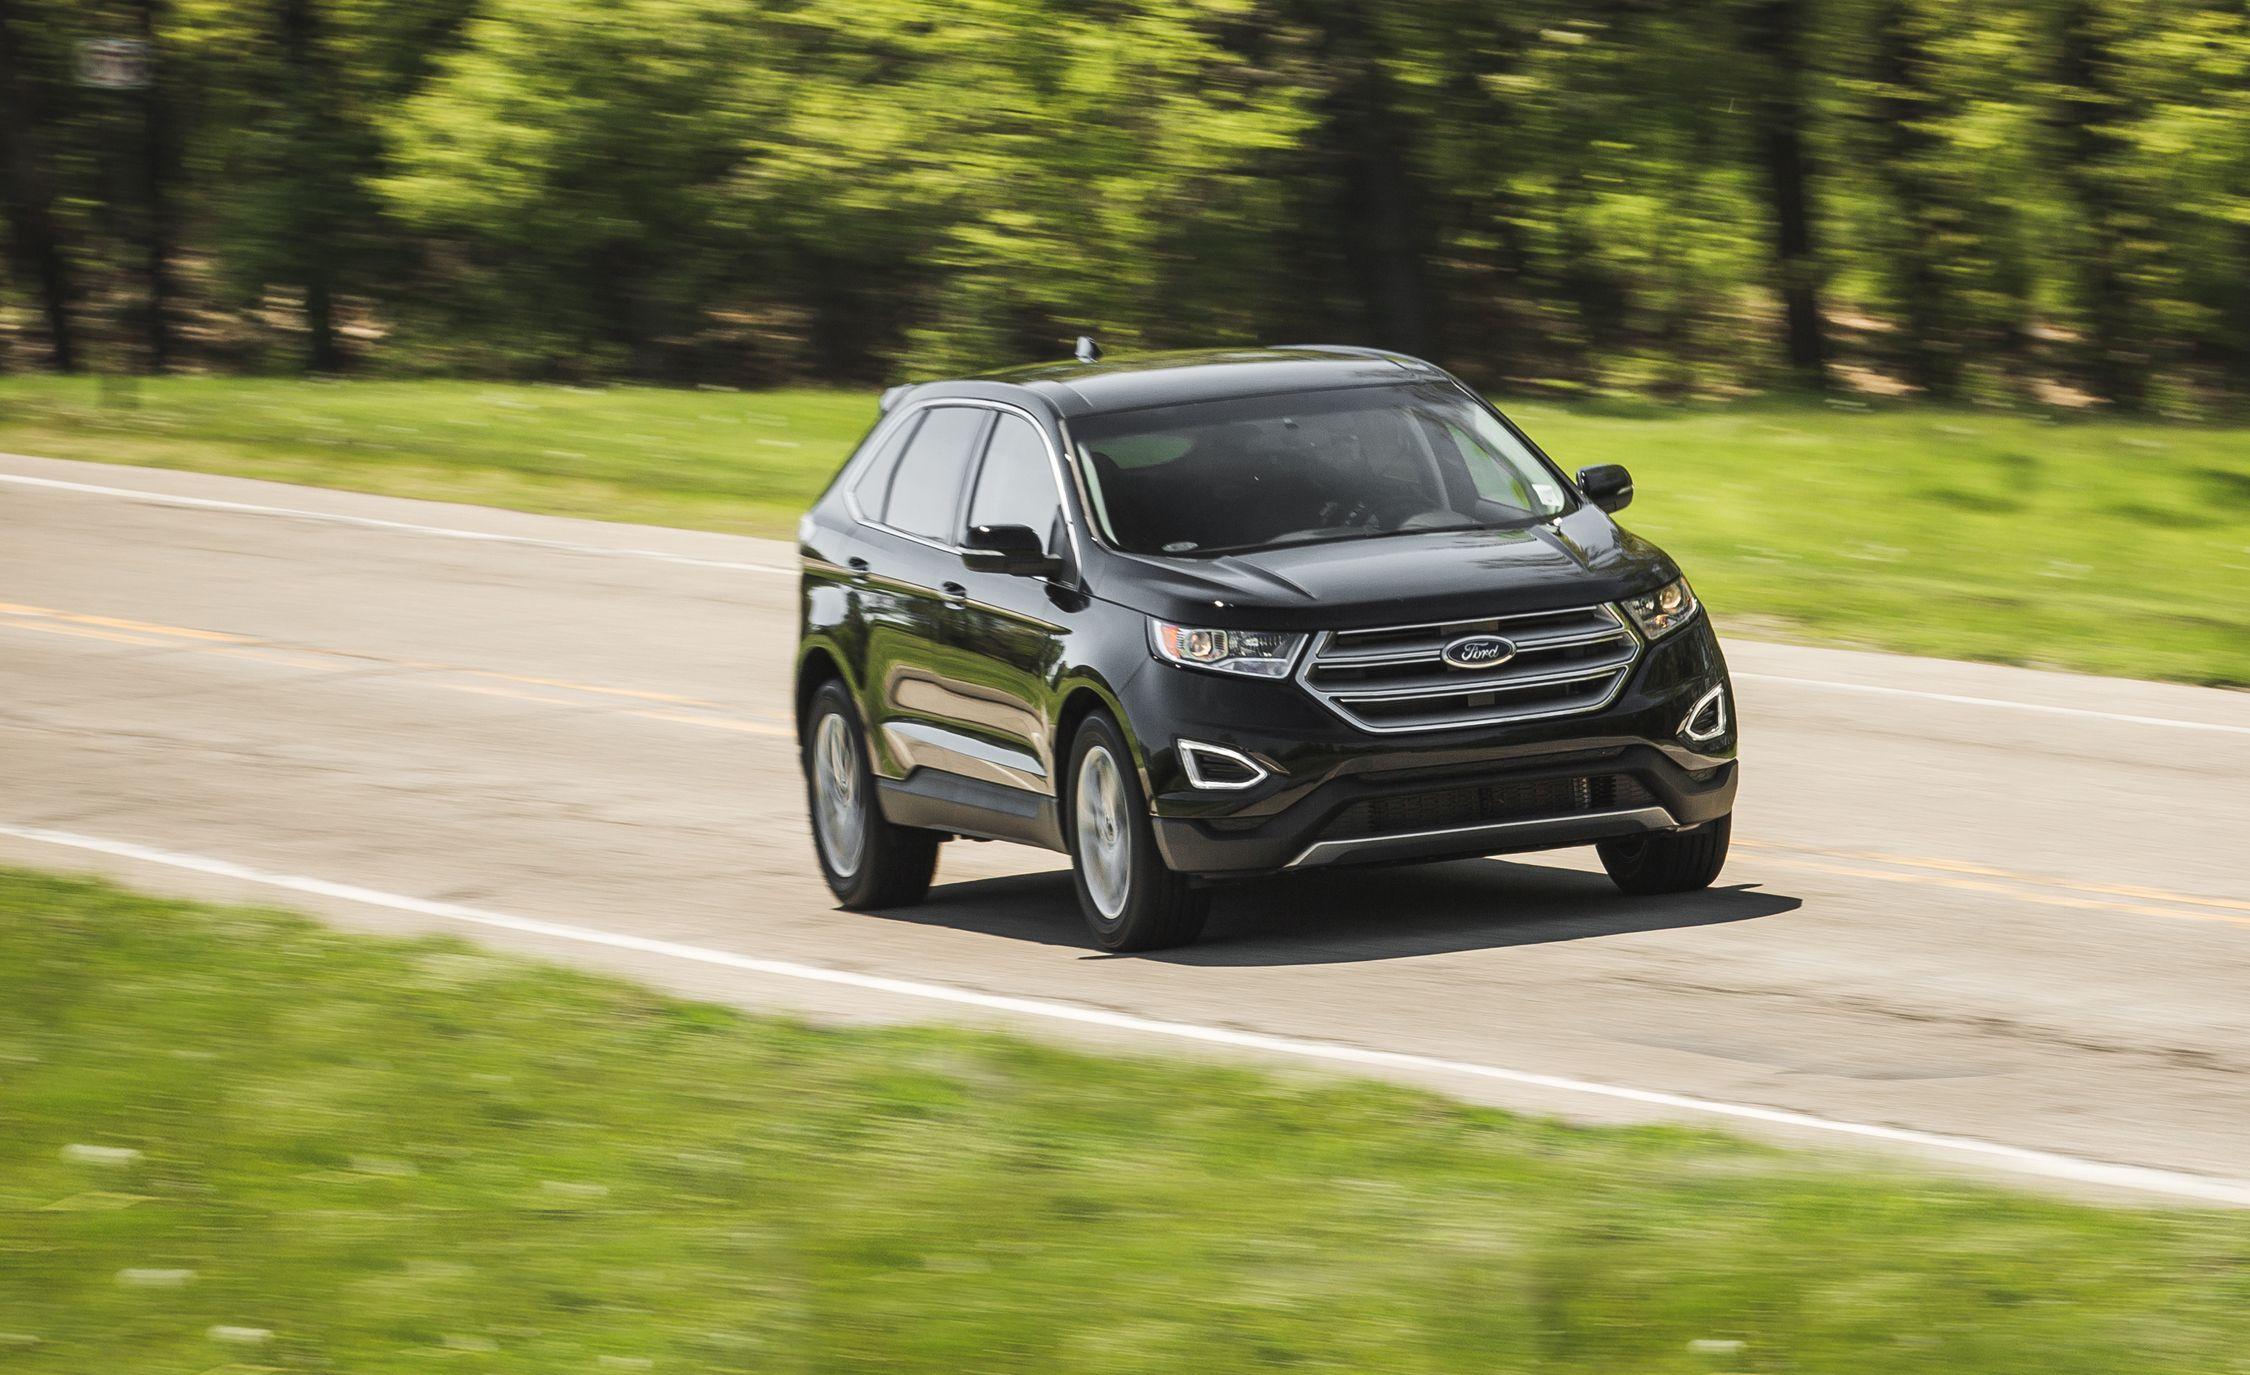 2017 ford edge 3 5l v 6 awd review car and driver rh caranddriver com